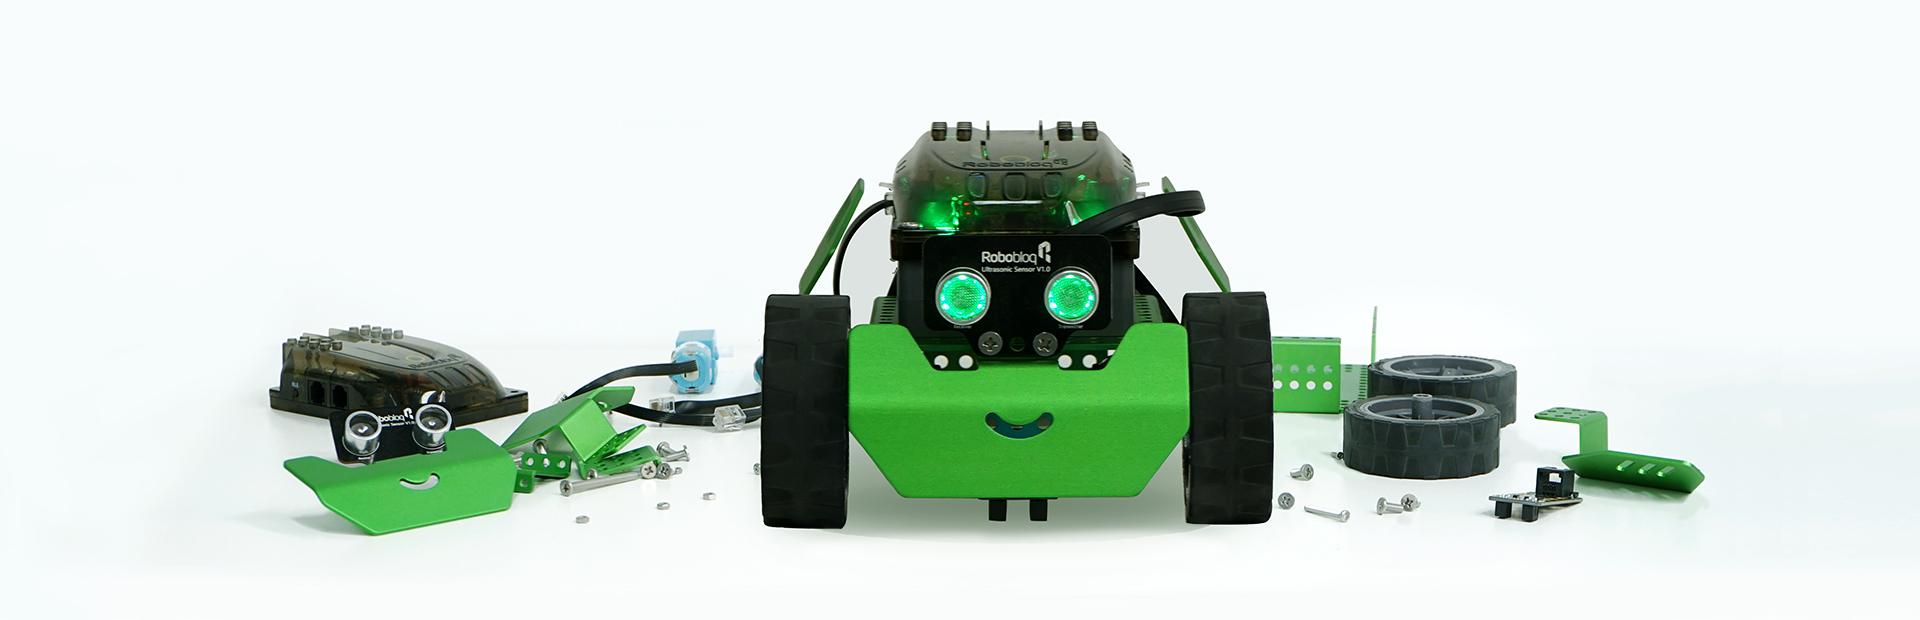 Robot Q-Scout Robobloq educational